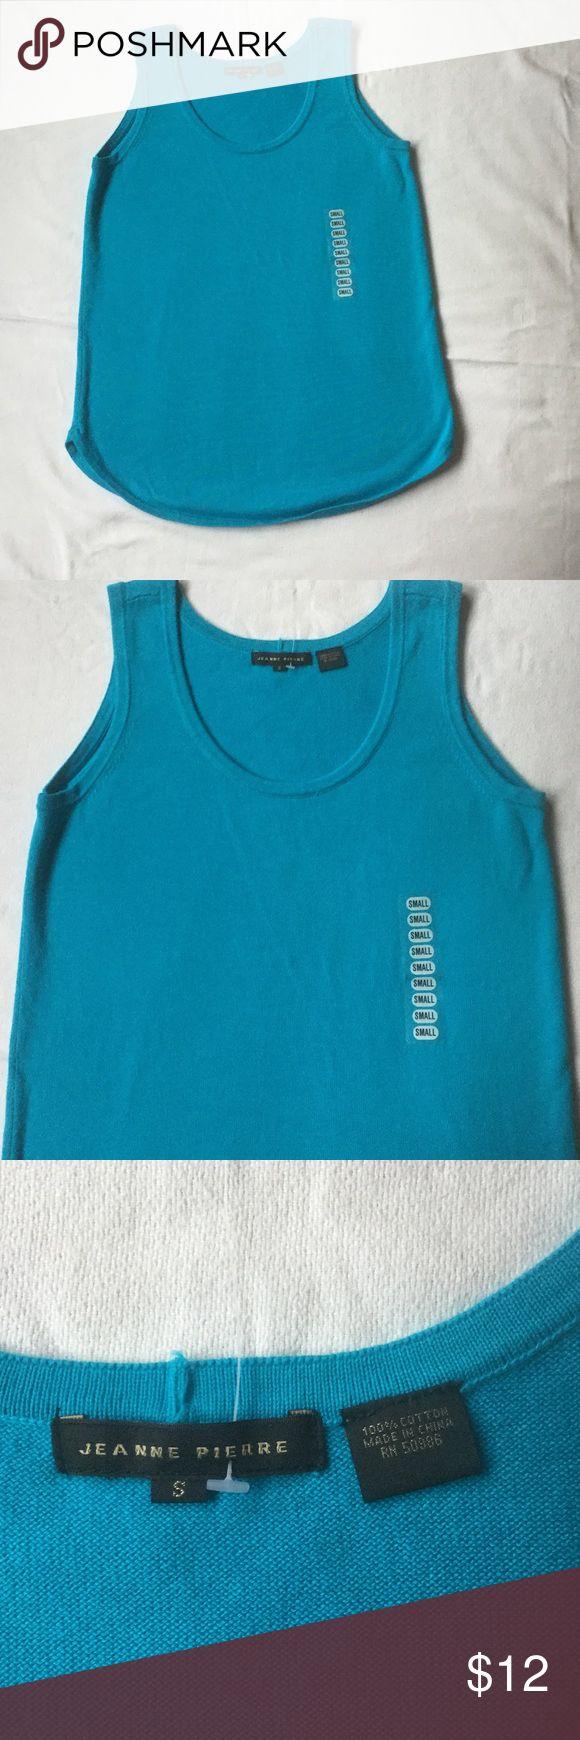 Jeanne Pierre Top New size S 100% cotton Top. Offers welcome Jeanne Pierre Tops